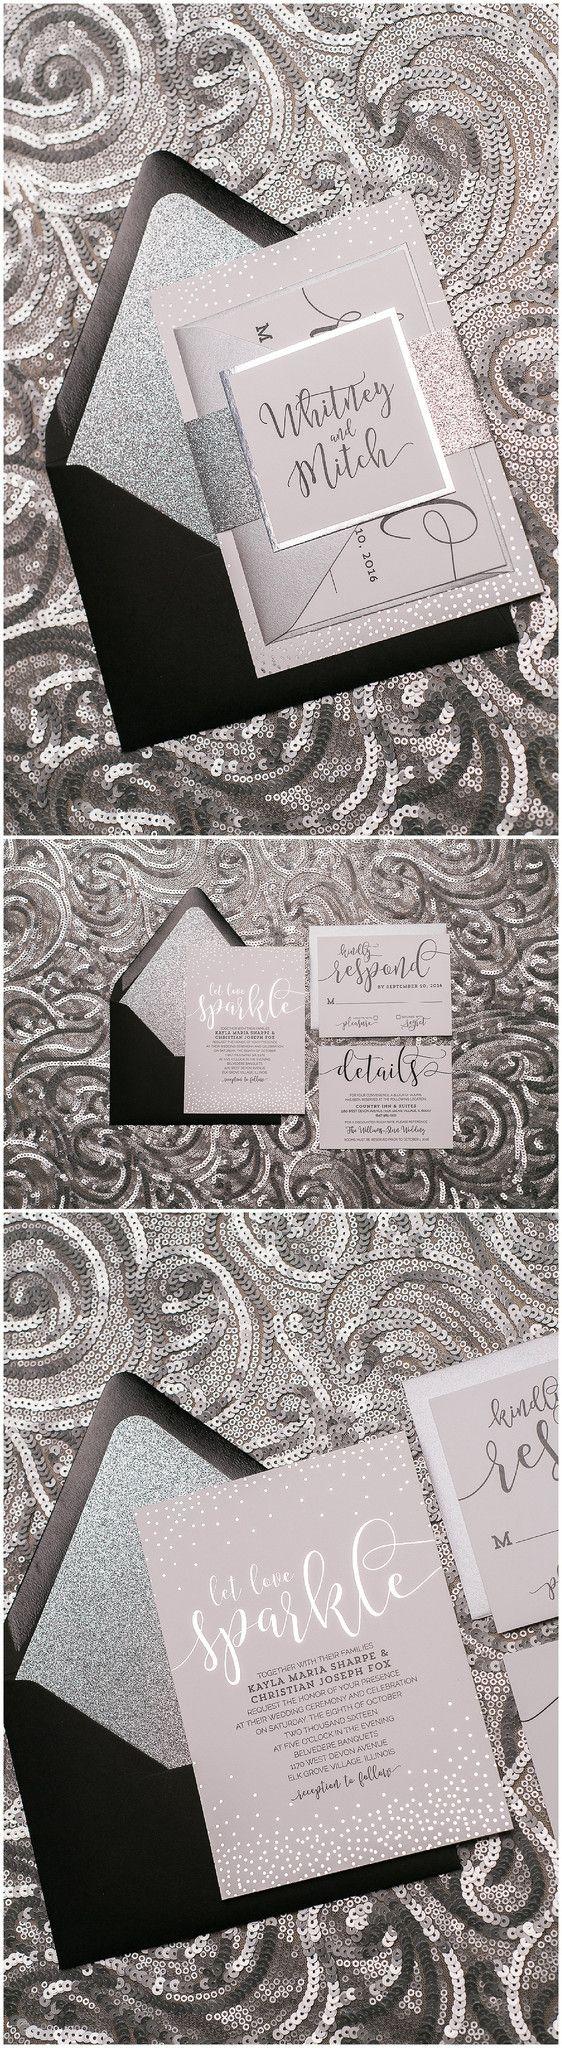 Sparkle, Foil, Silver, Black, Digital, Glitter, New Year's Eve, Black Tie, Wedding Invitations